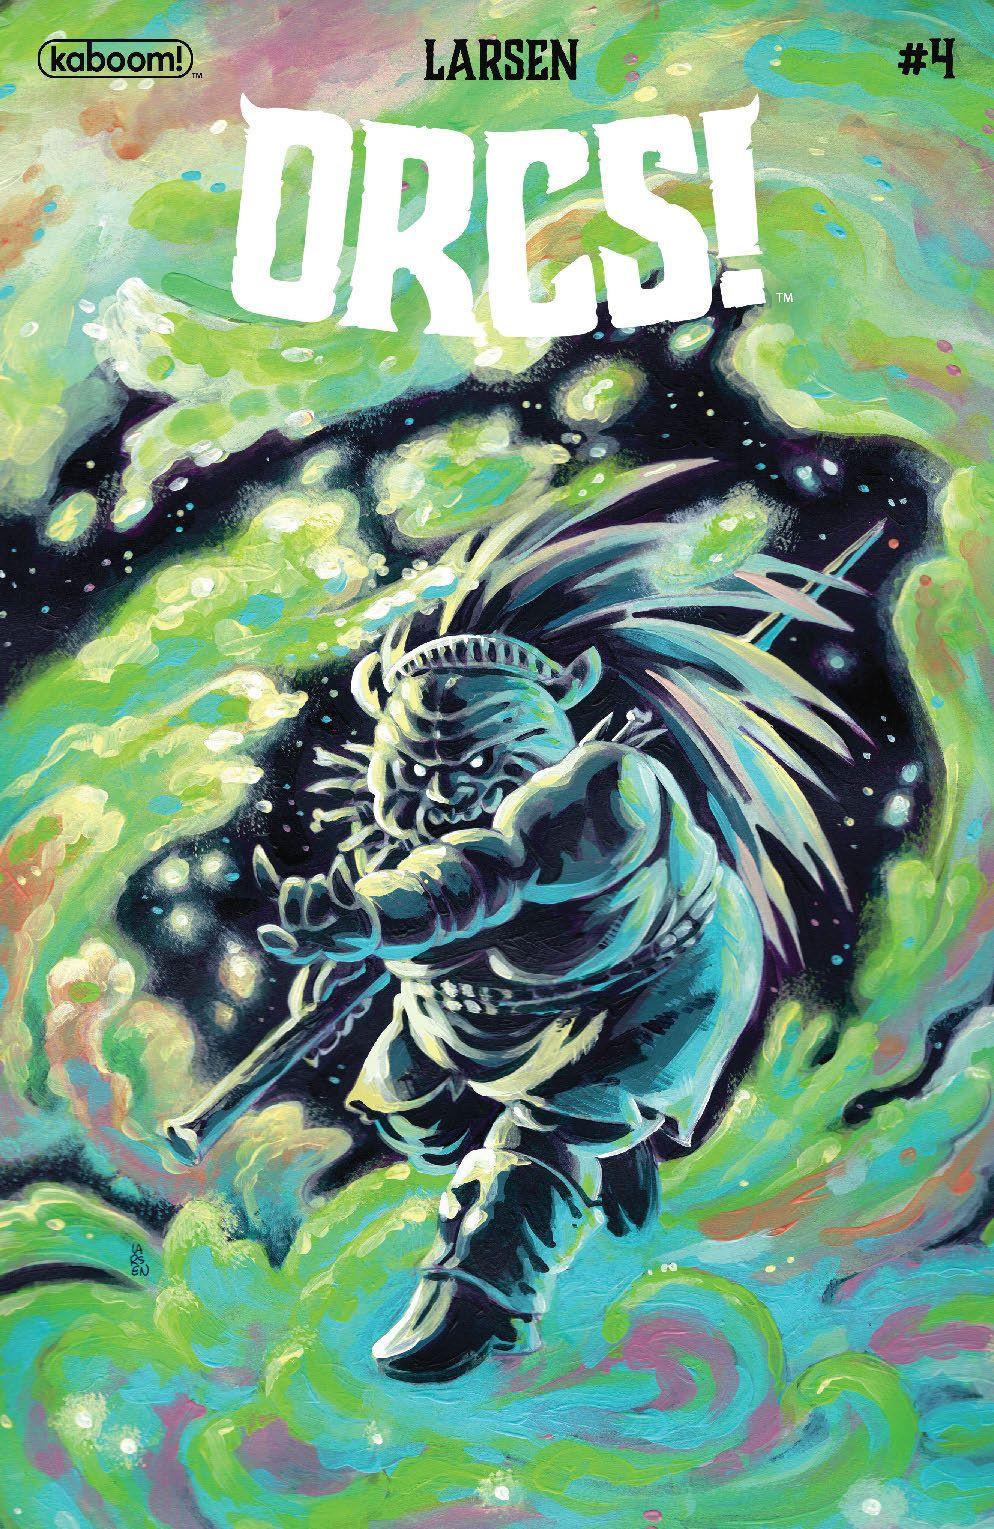 Orcs_004_Cover_A_Main ComicList Previews: ORCS! #4 (OF 6)